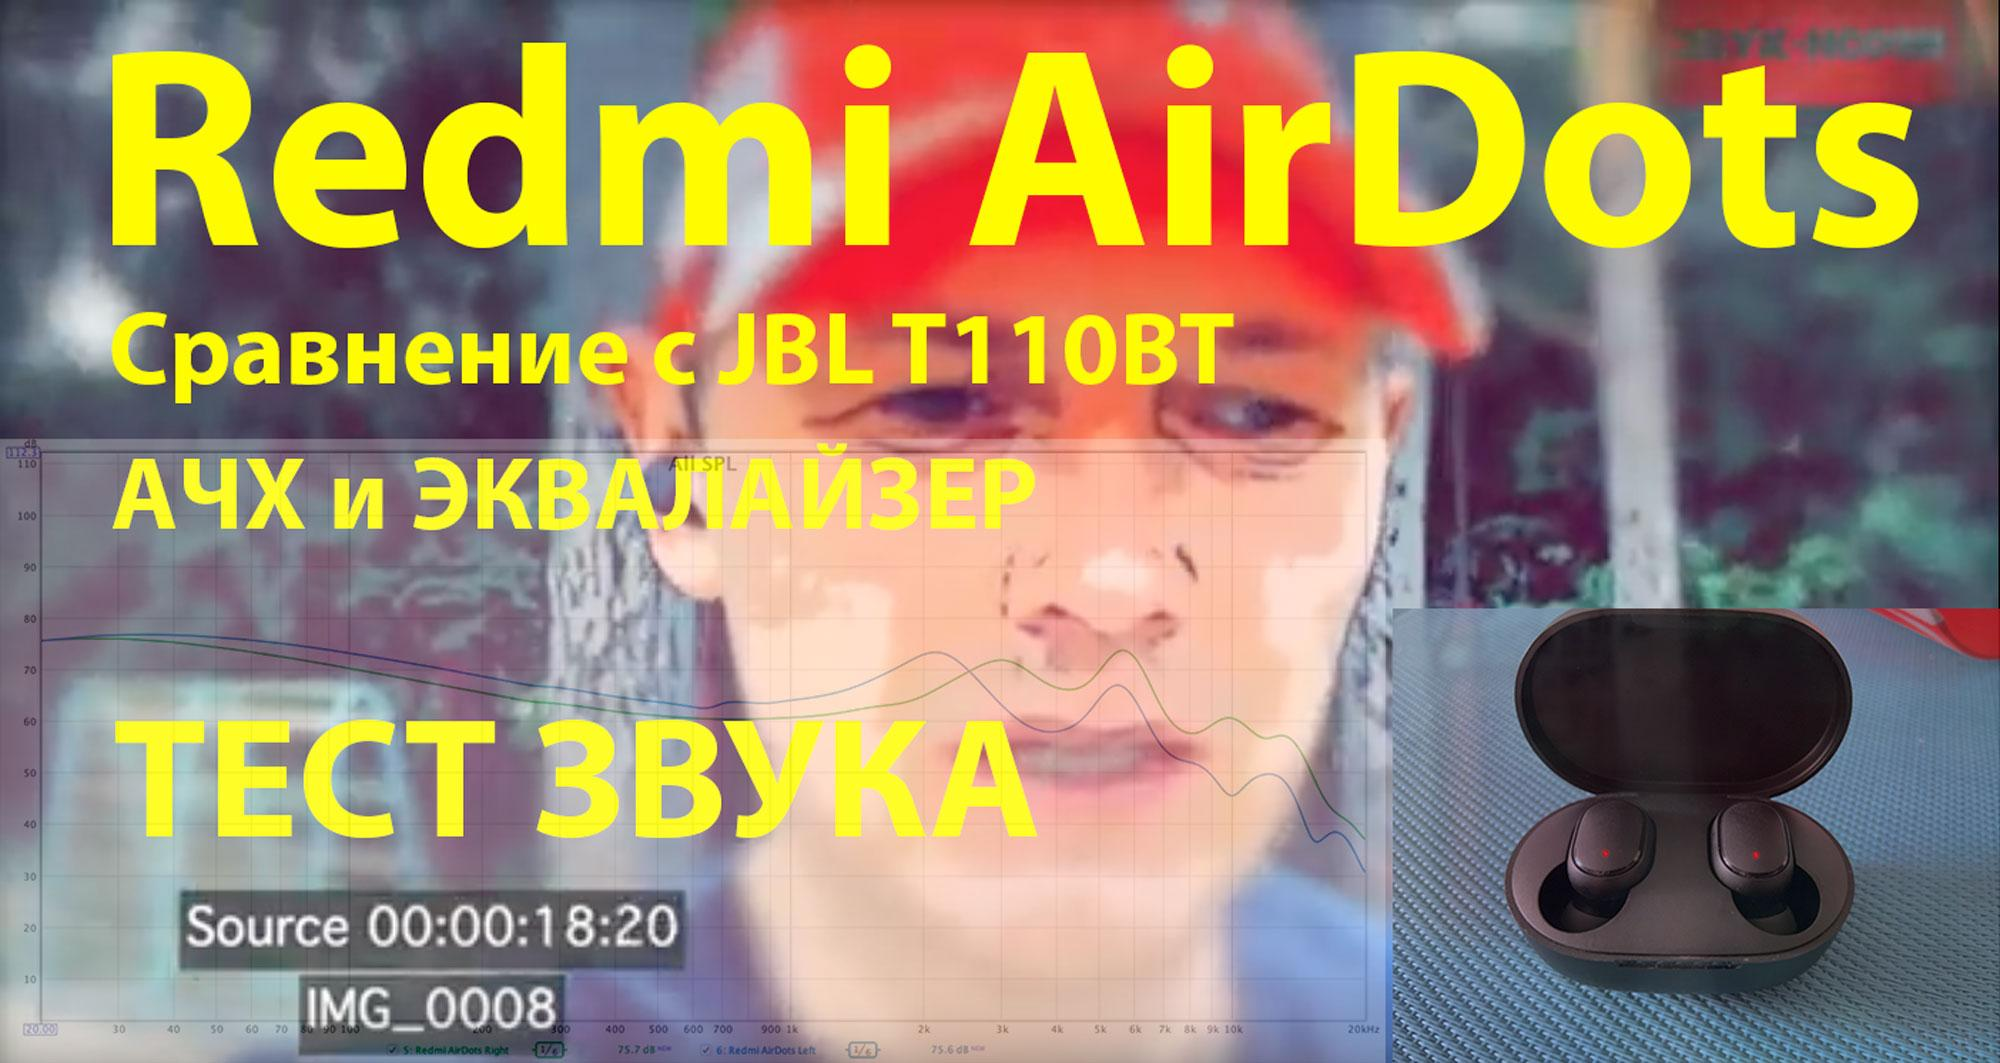 Redmi AirDots // АЧХ, ЭКВАЛАЙЗЕР, ТЕСТ ЗВУКА // Сравнение с JBL T110BT